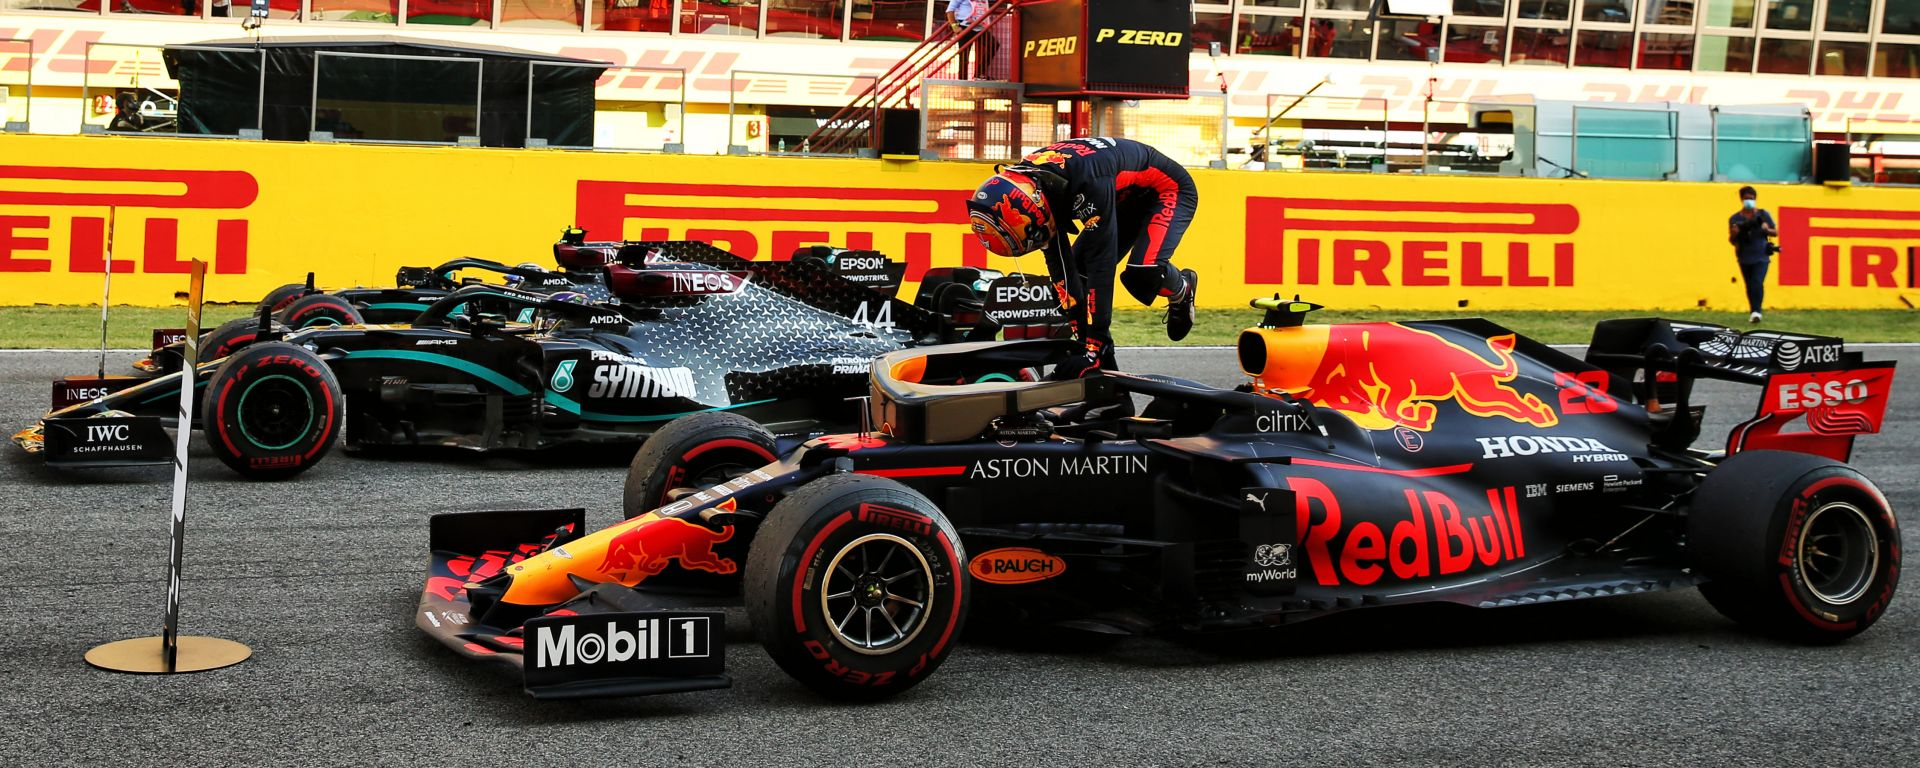 F1 GP Toscana 2020, Mugello: Lewis Hamilton (Mercedes) e Alexander Albon (Red Bull) all'arrivo